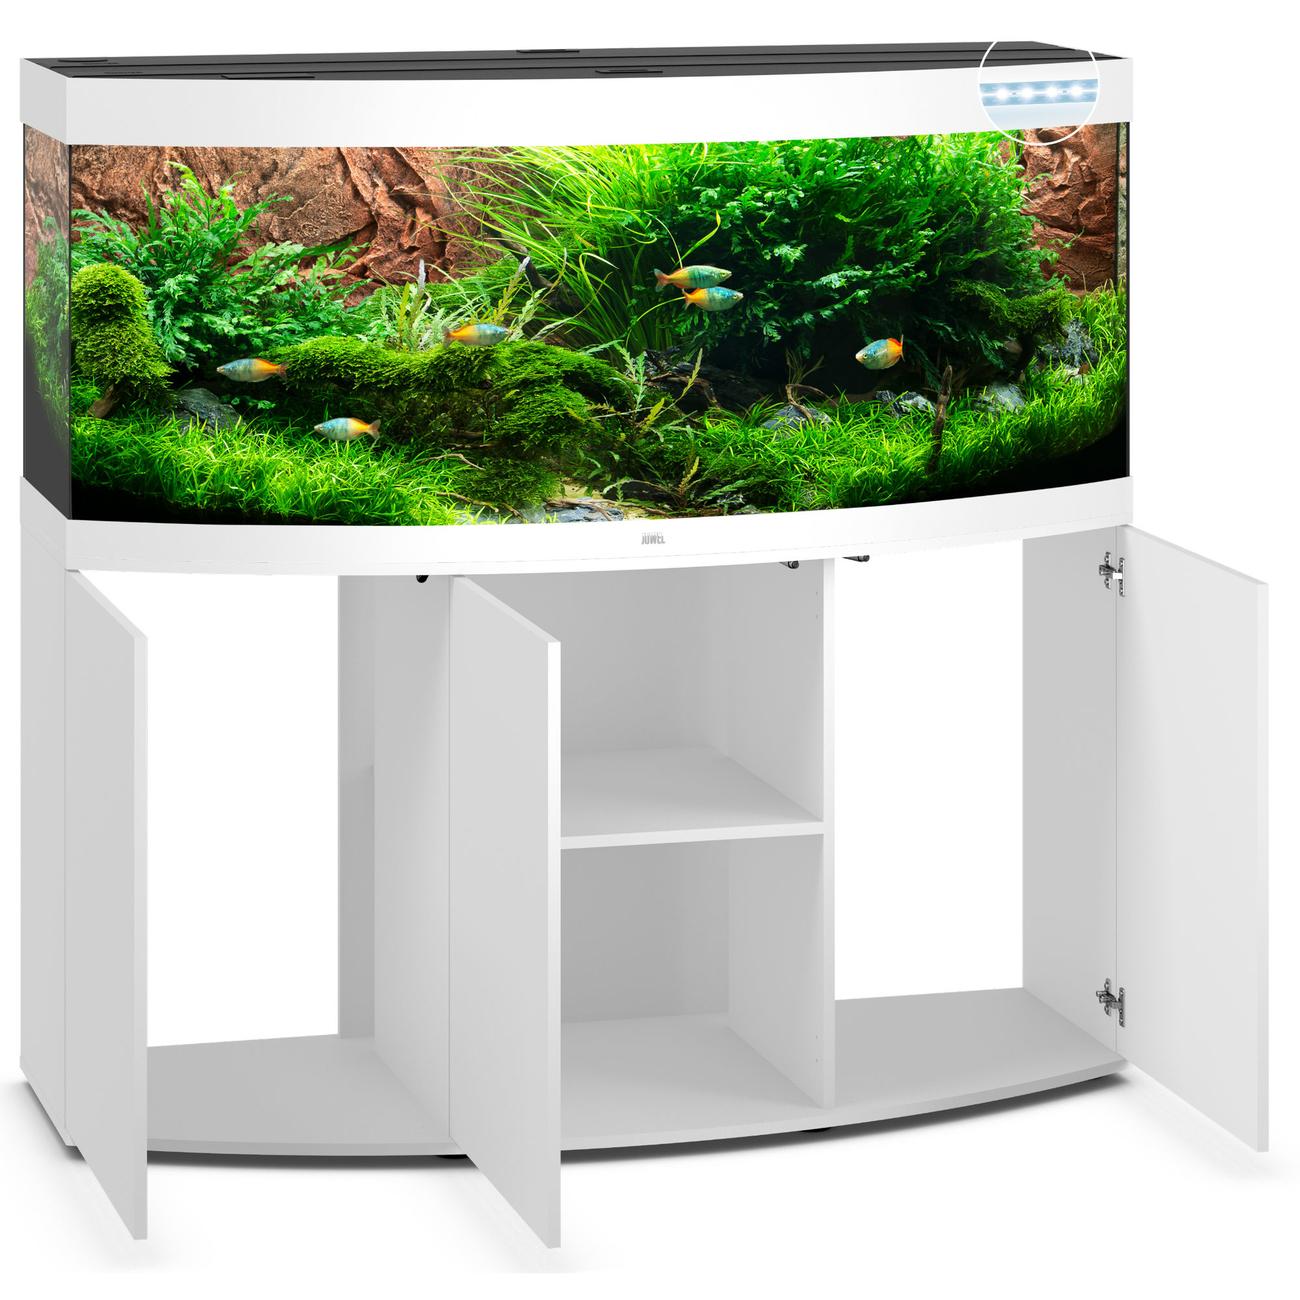 JUWEL Vision 450 LED Aquarium mit Unterschrank Bild 10